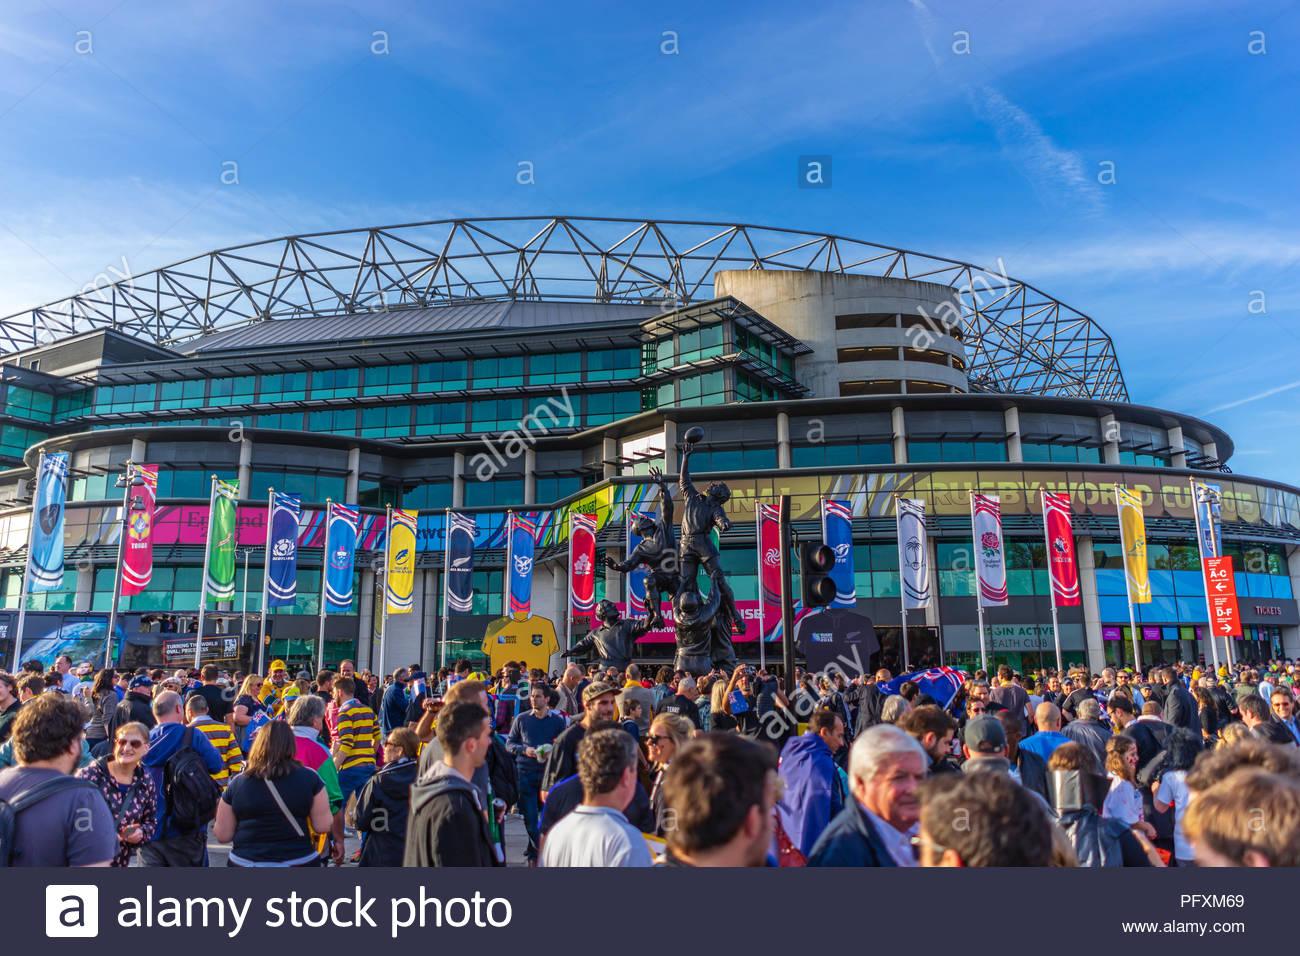 Twickenham Rugby Stadium on a big match day Stock Photo